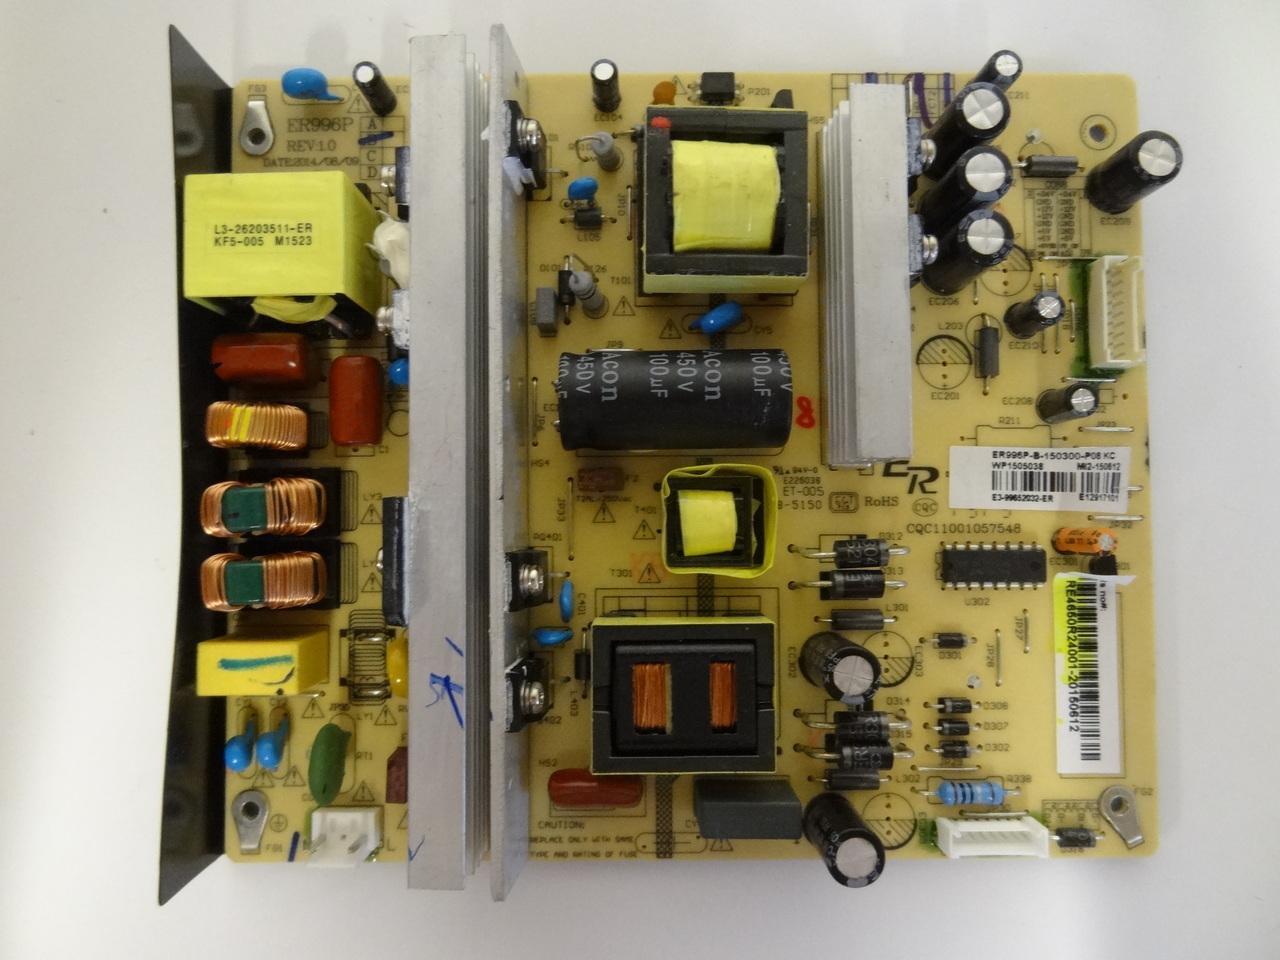 717265-002 HP Envy 700 Memphis-B Intel Desktop Motherboard s115X